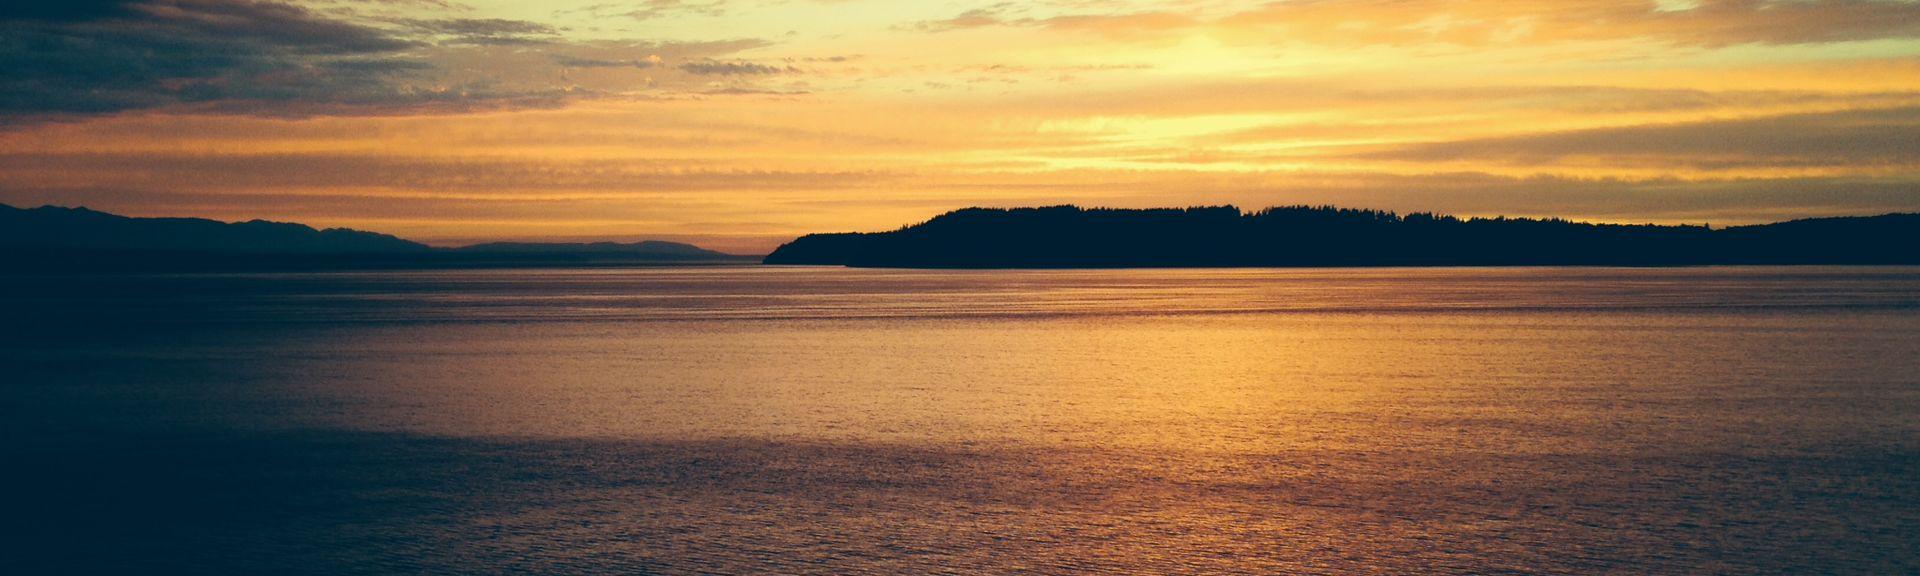 Picnic Point-North Lynnwood, Washington, USA